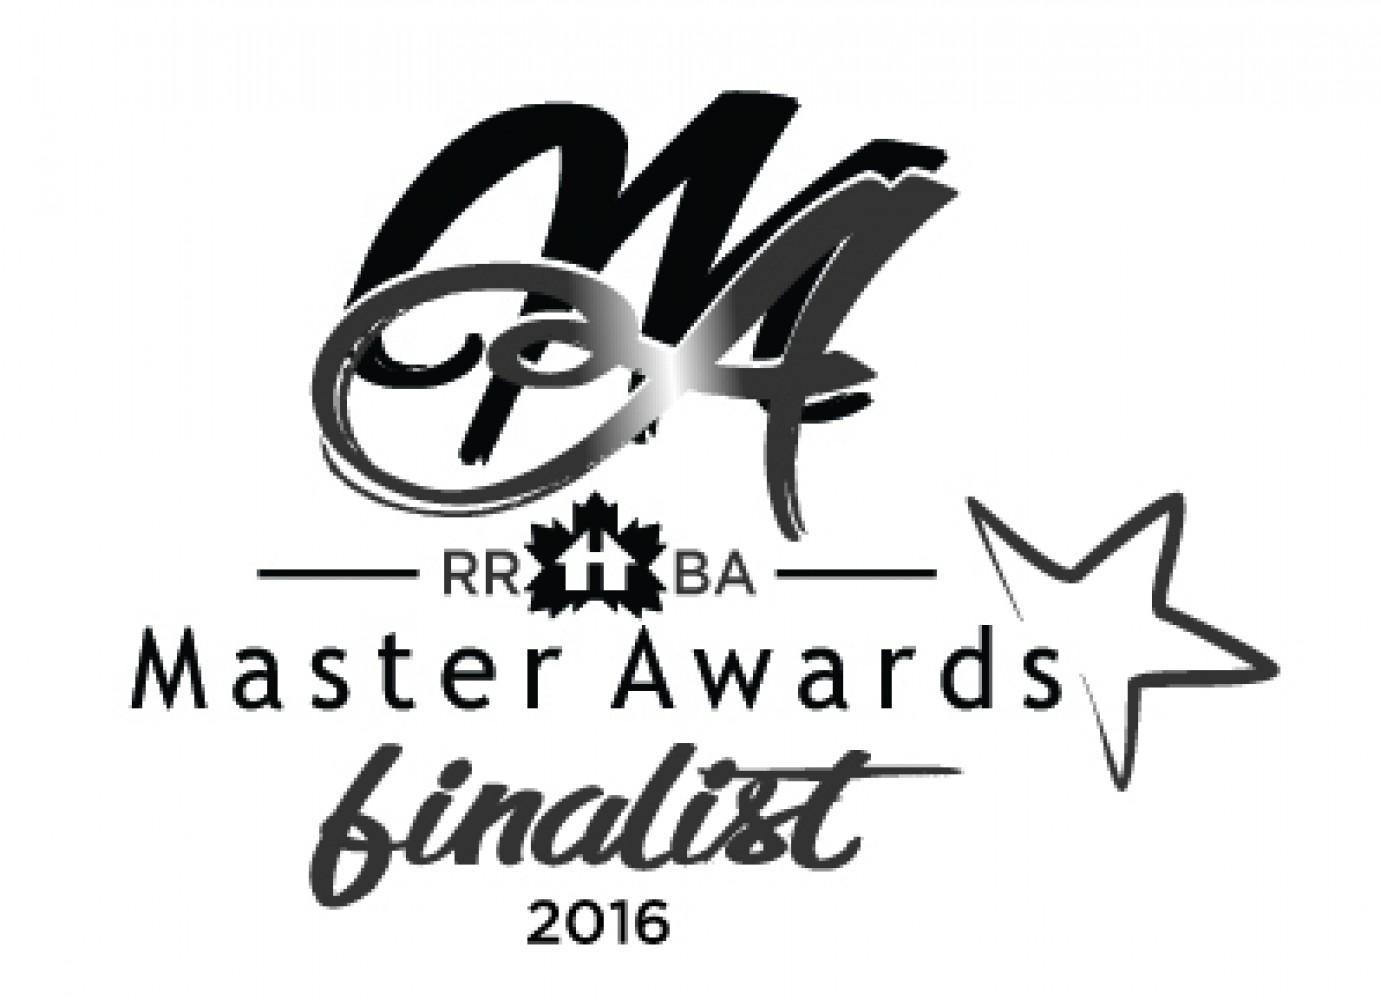 2016 Master Award Finalist